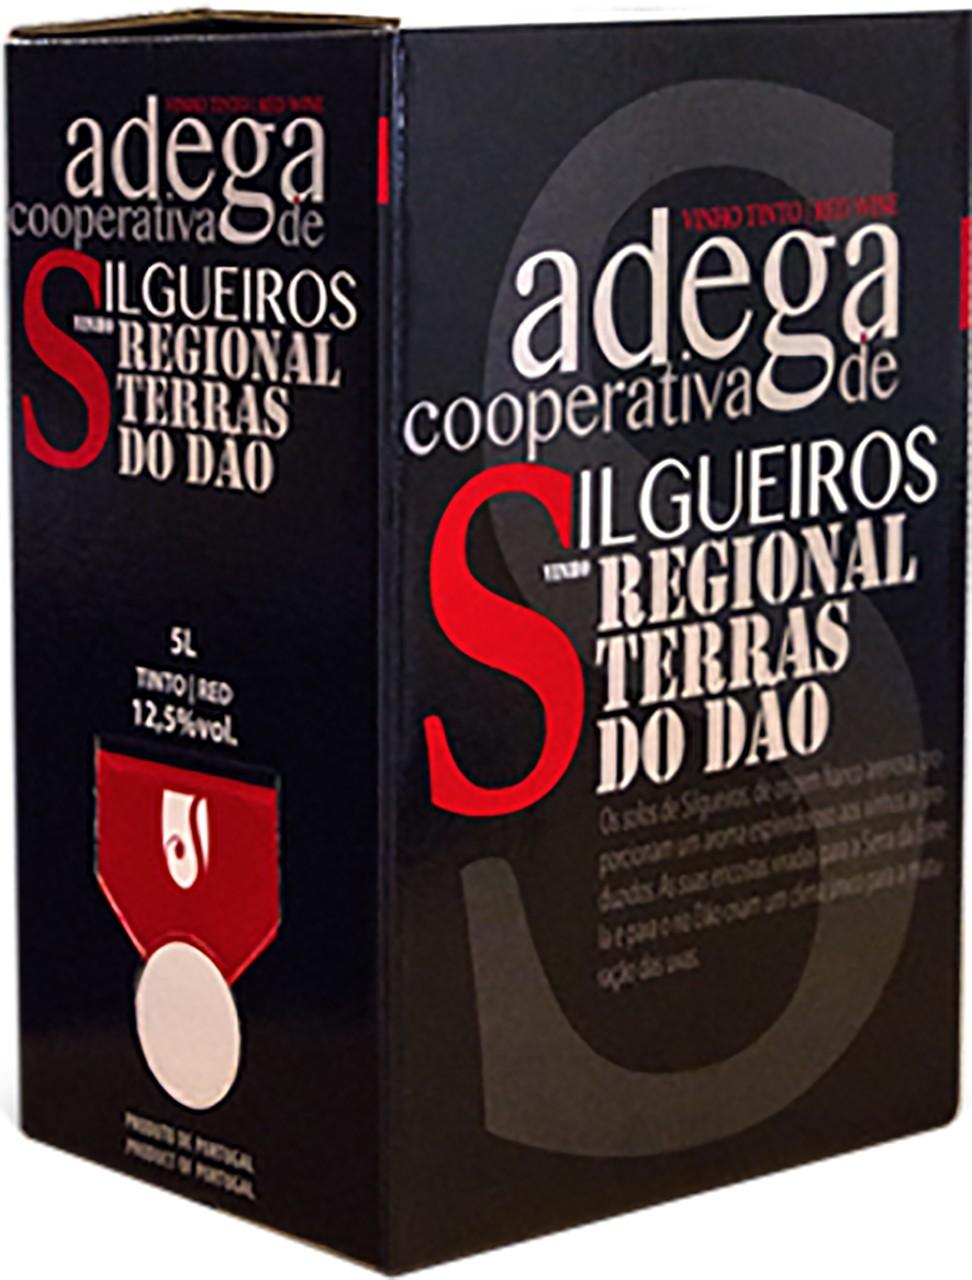 Silgueiros Tinto 5 Ltr. - Rotwein - Bag in Box - Dão - Portugal